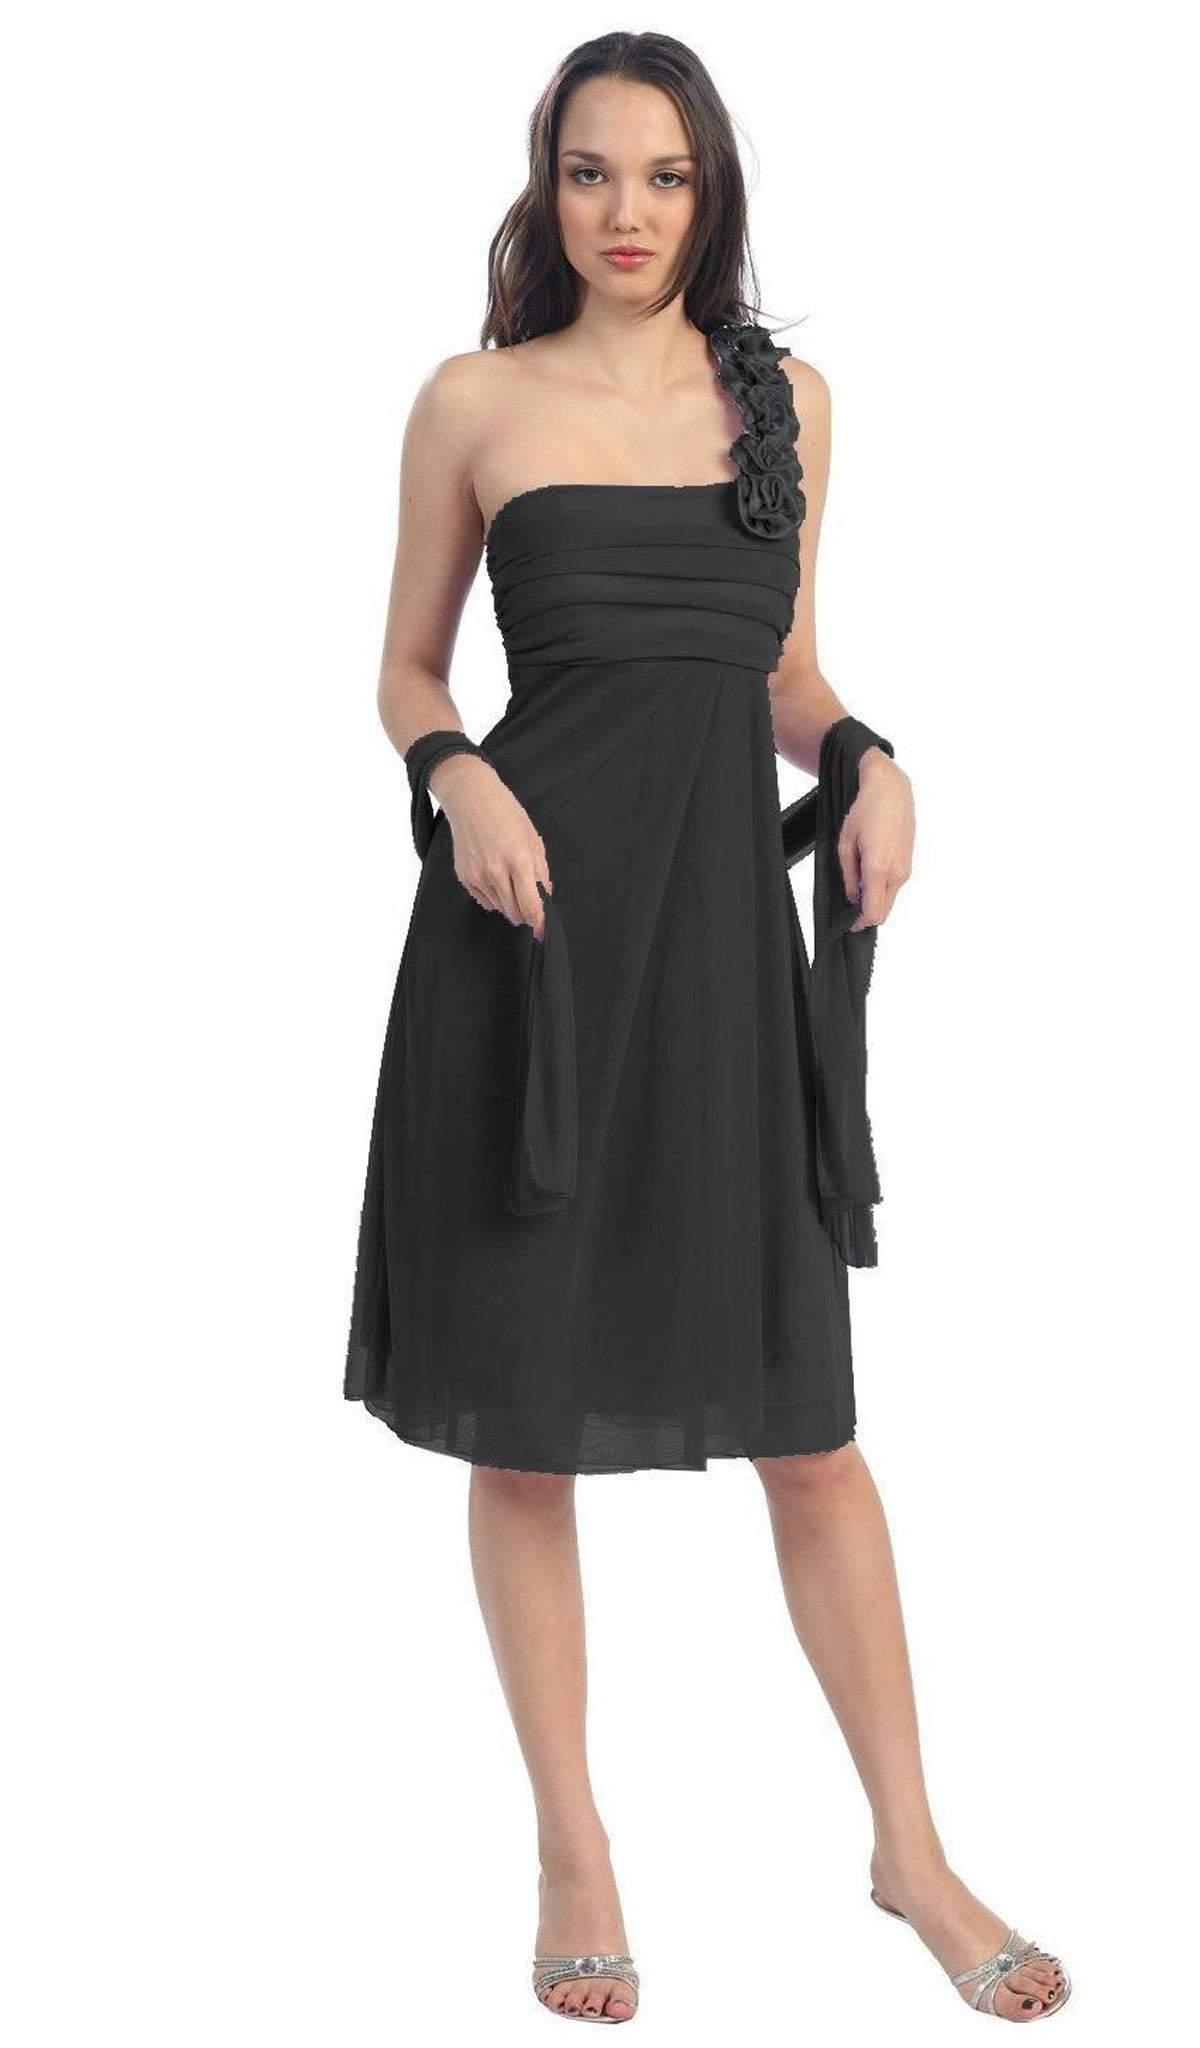 Eureka Fashion - 1801 Rosette Strap Empire Waist Cocktail Dress